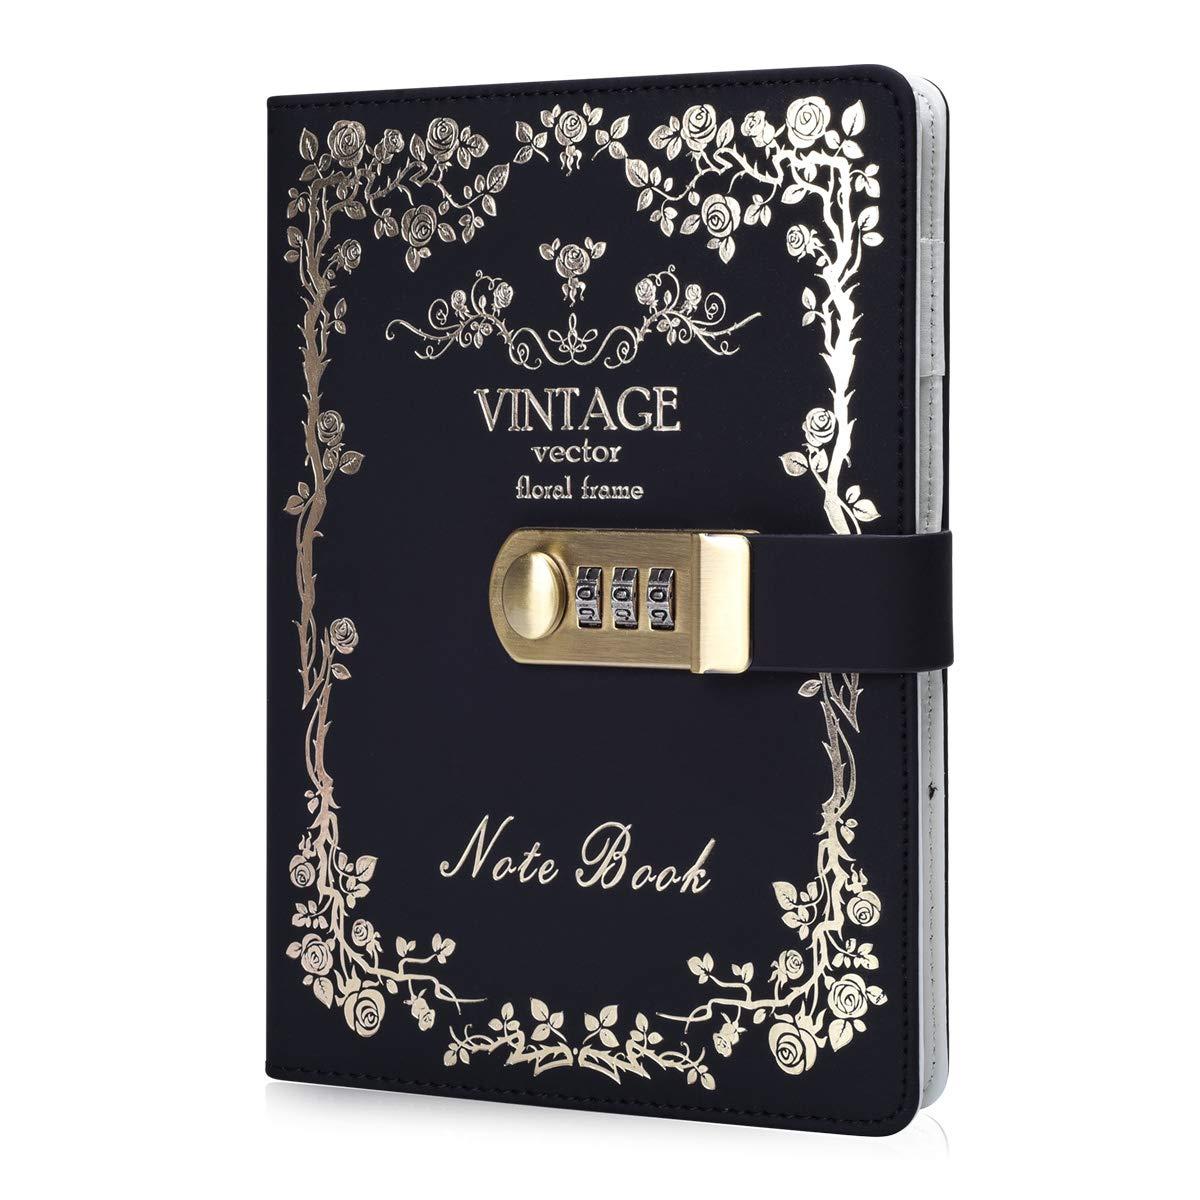 ARRLSDB Digital Password Lock Diary PU Leather Journal with Combination Lock (Diary with Combination Lock) Password Journal Locking Journal Diary (Black+Golden)